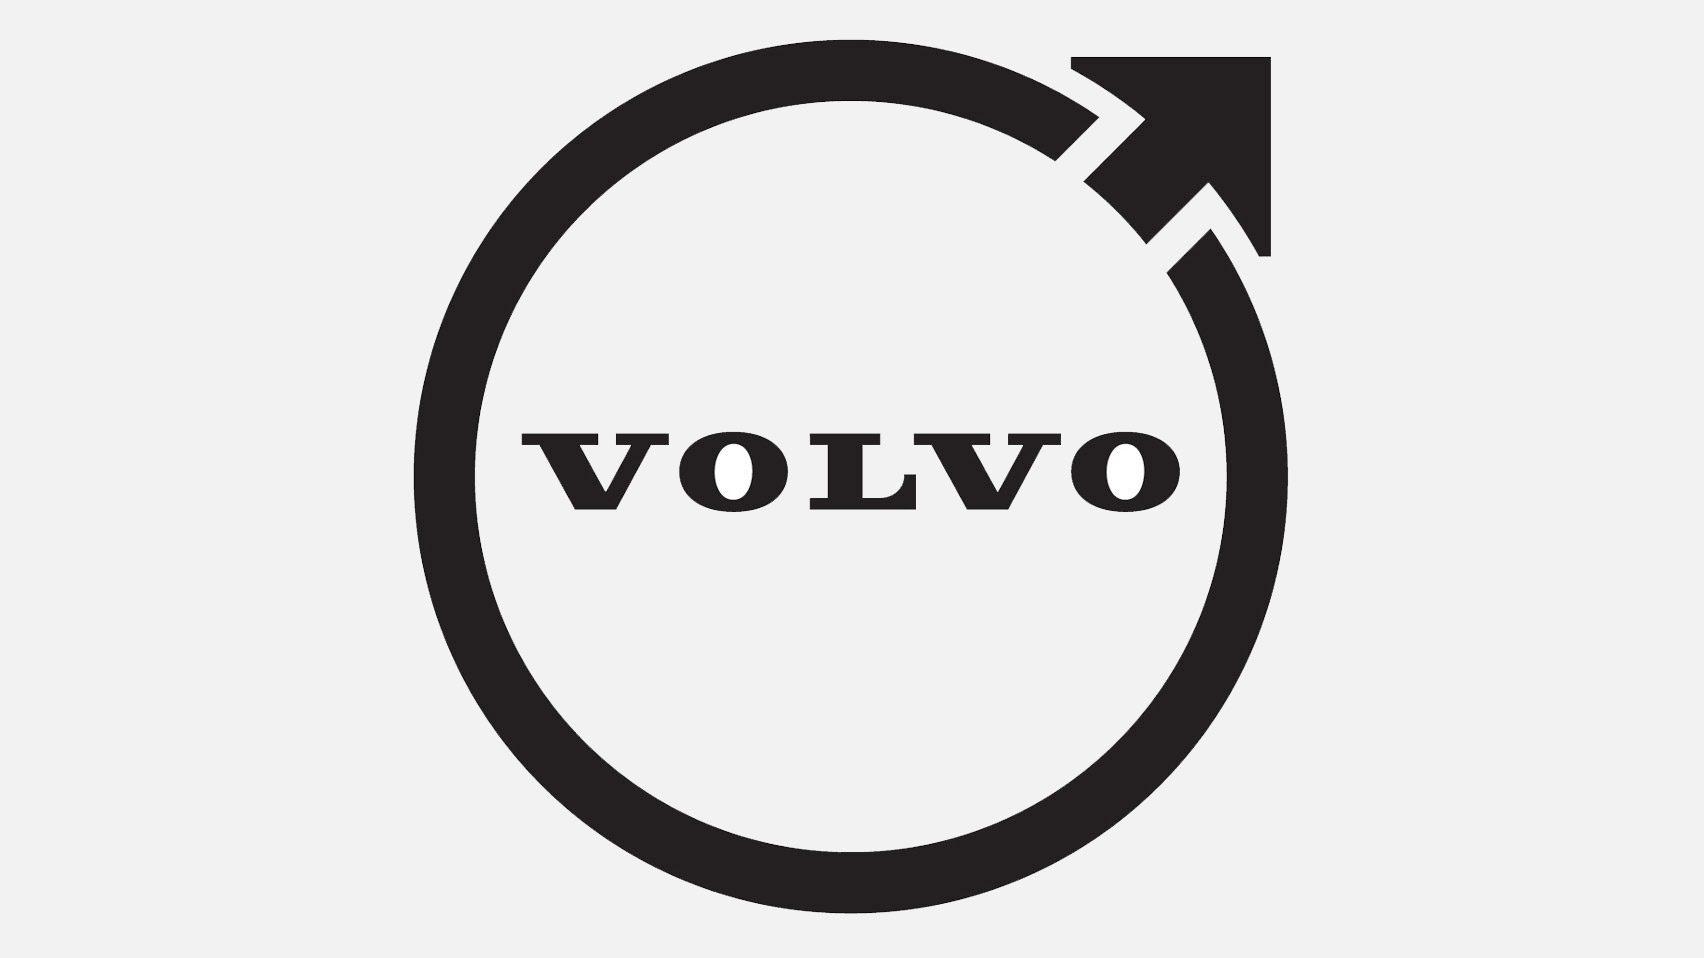 A black and white circular Volvo logo